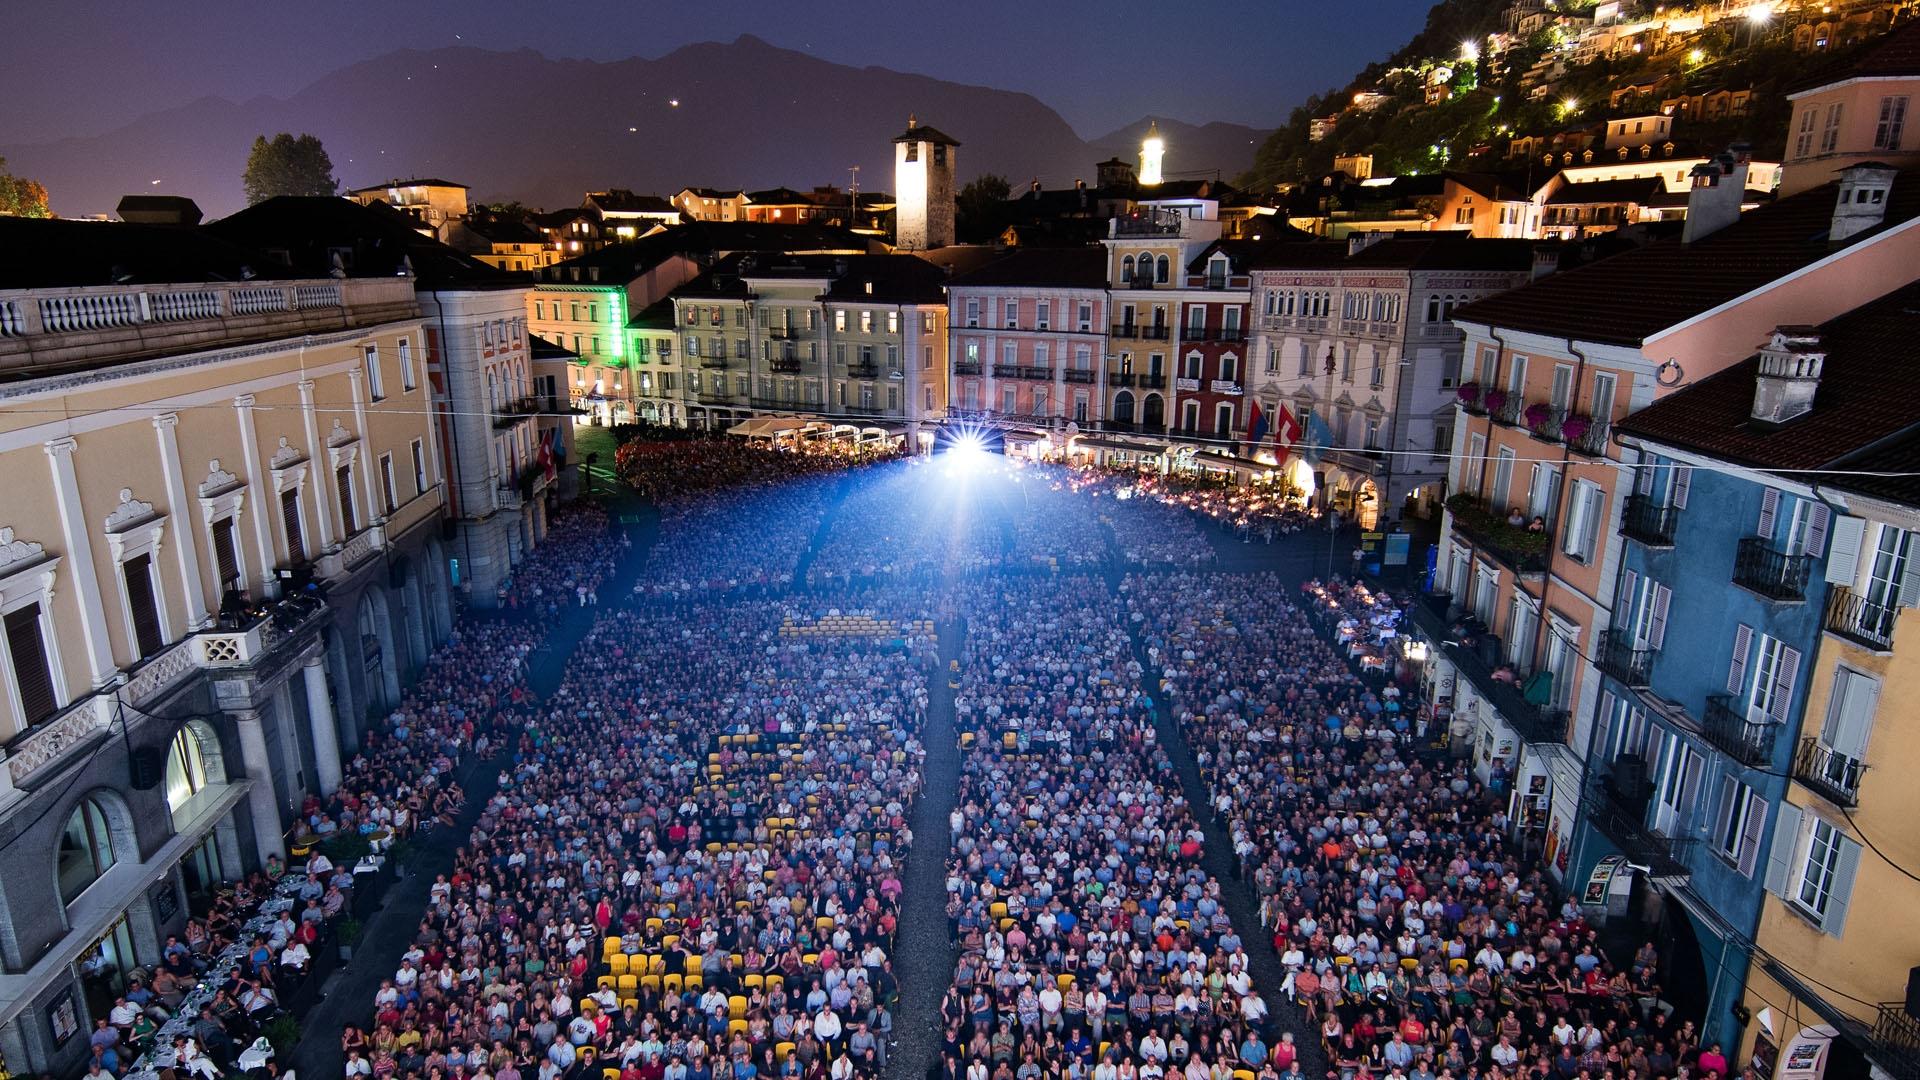 locarno_festival2.jpg.2017-10-18-16-17-47.jpg